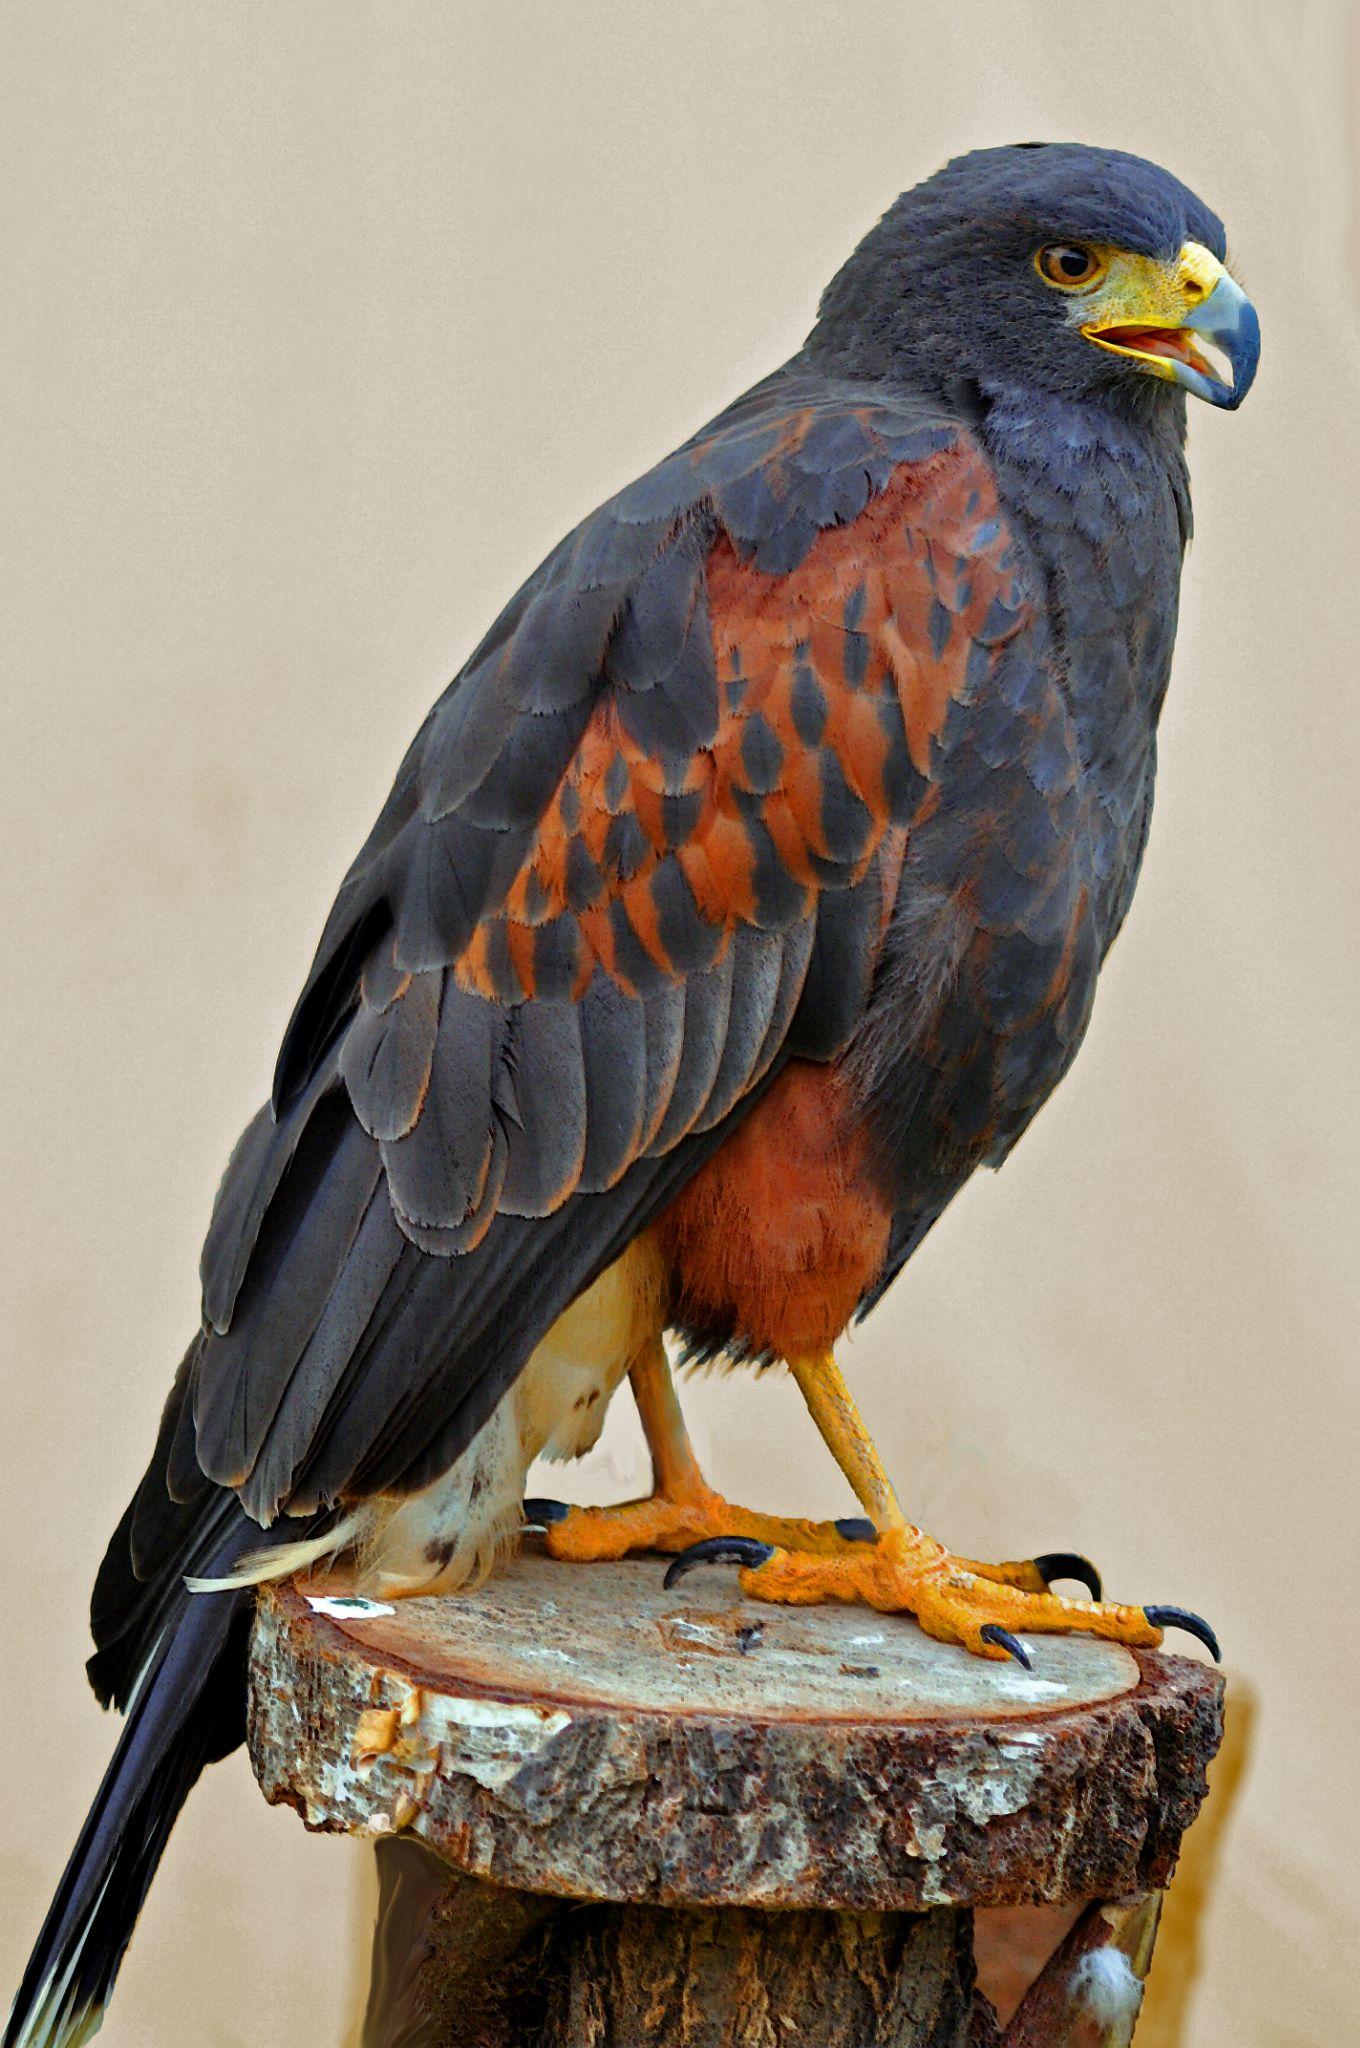 Harris' Hawk 1 by Marco Bertamé